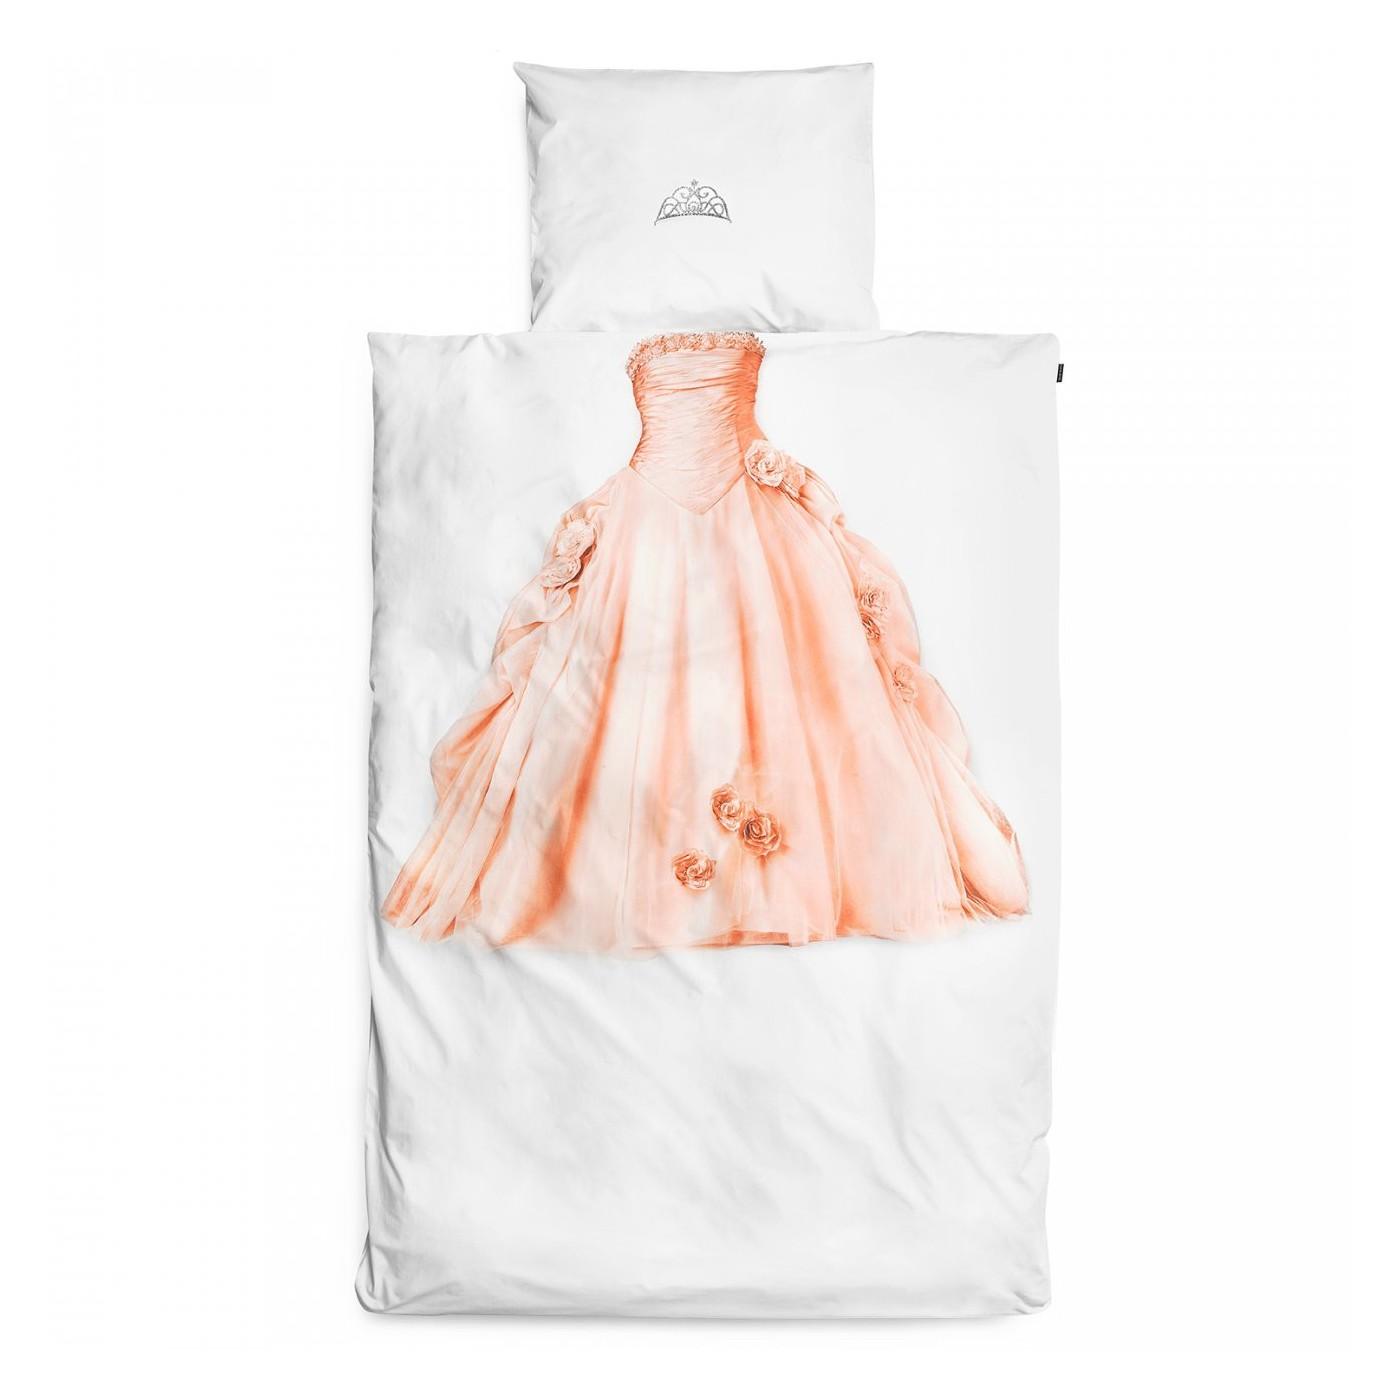 housse de couette princesse 140x200 yadayada. Black Bedroom Furniture Sets. Home Design Ideas